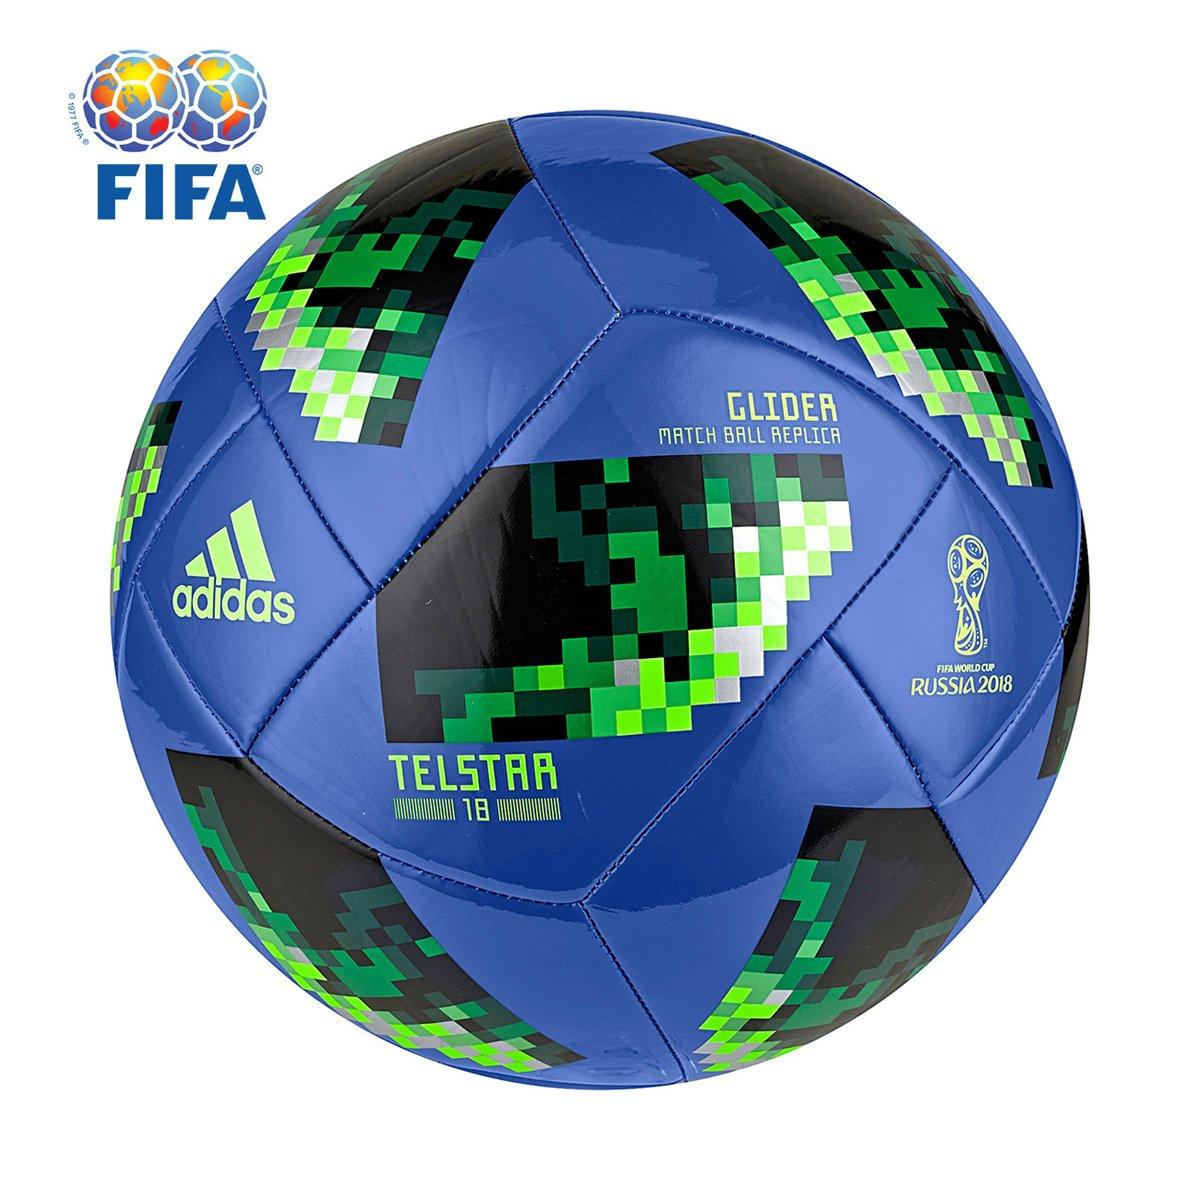 919a0b94d Bola Futebol Campo Adidas Telstar 18 Glider Copa do Mundo FIFA ...